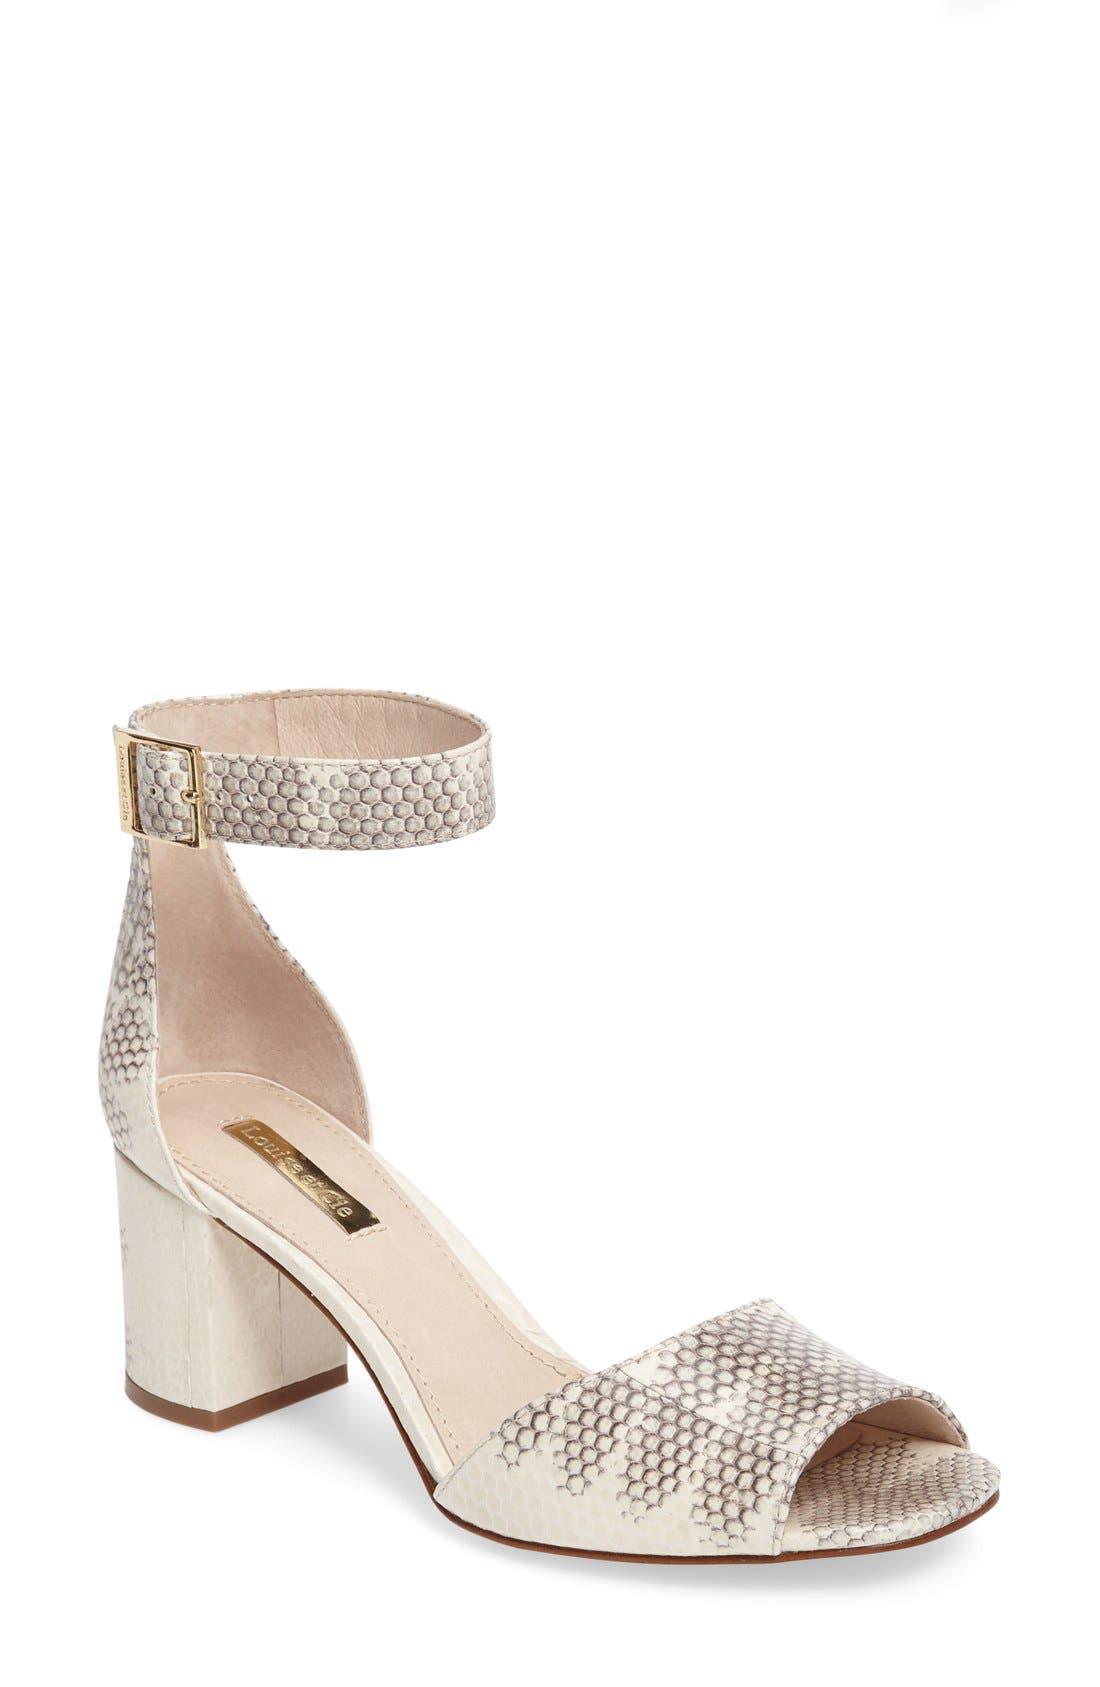 Louise et Cie Karisa Ankle Cuff Sandal (Women)